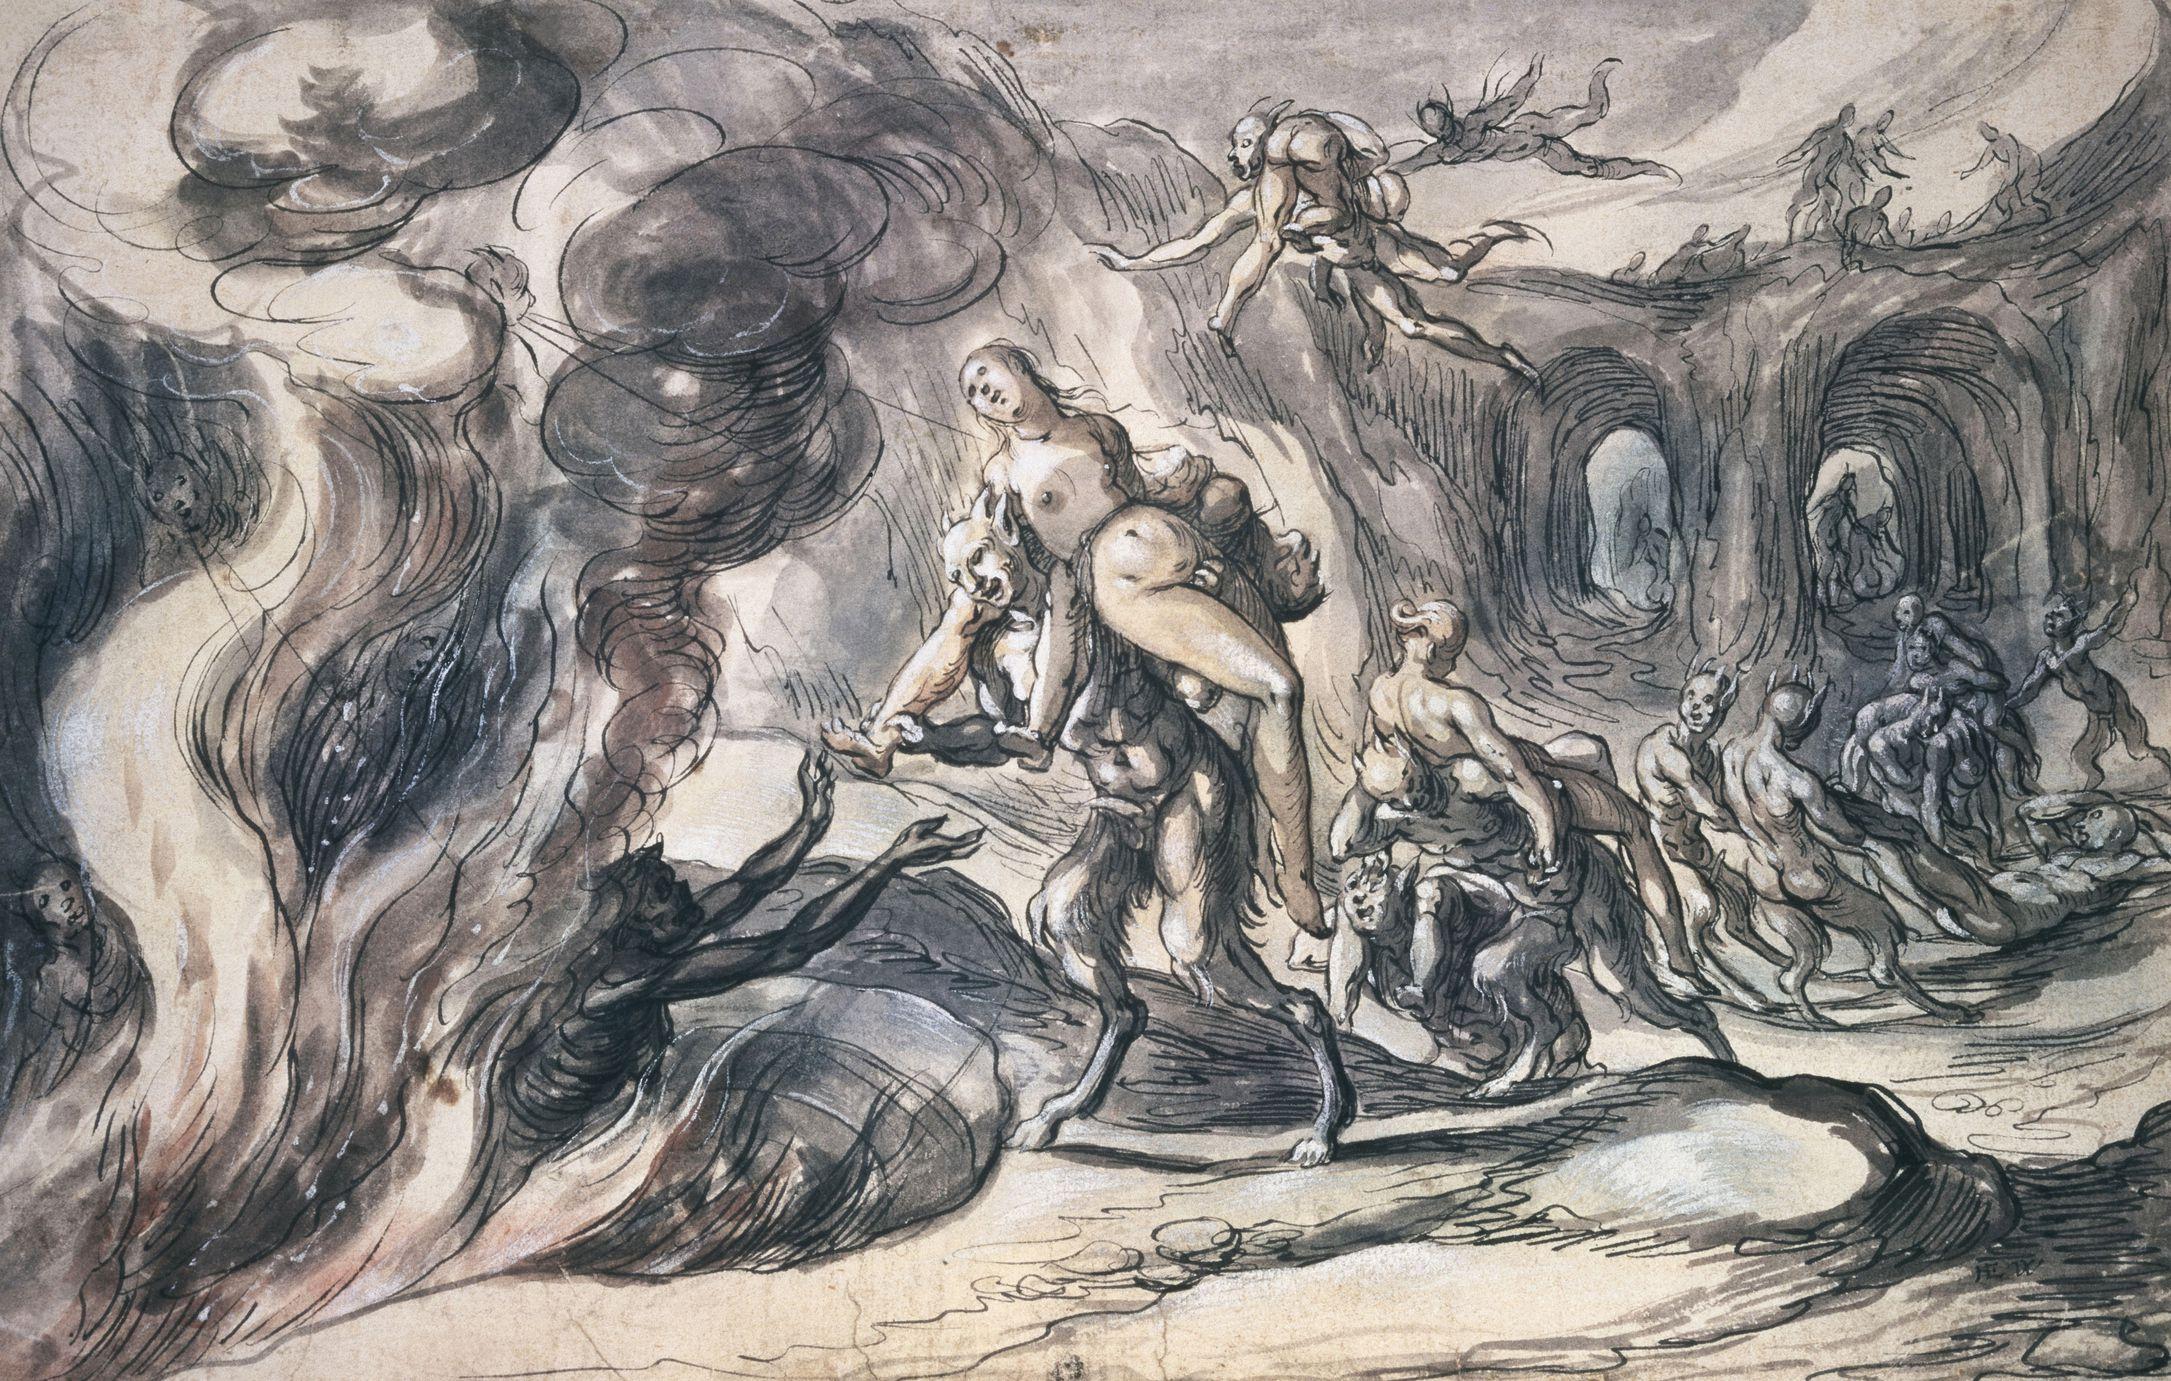 Hades, Patron God of the Underworld in Greek Mythology